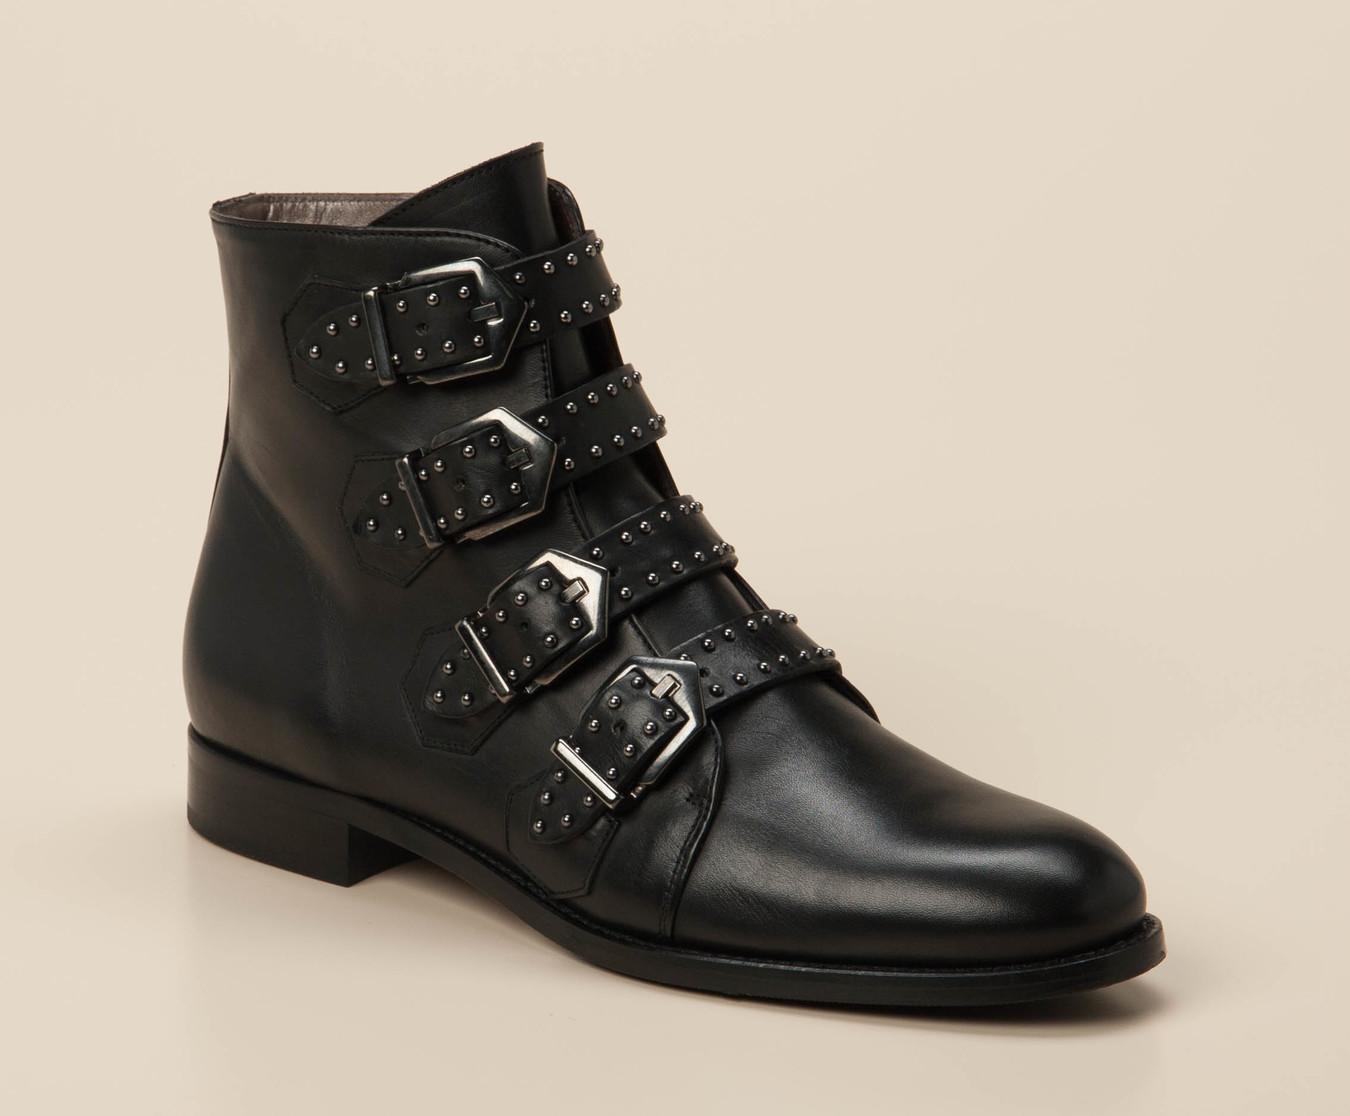 5041fddea81c87 Pertini Damen Stiefelette in schwarz kaufen